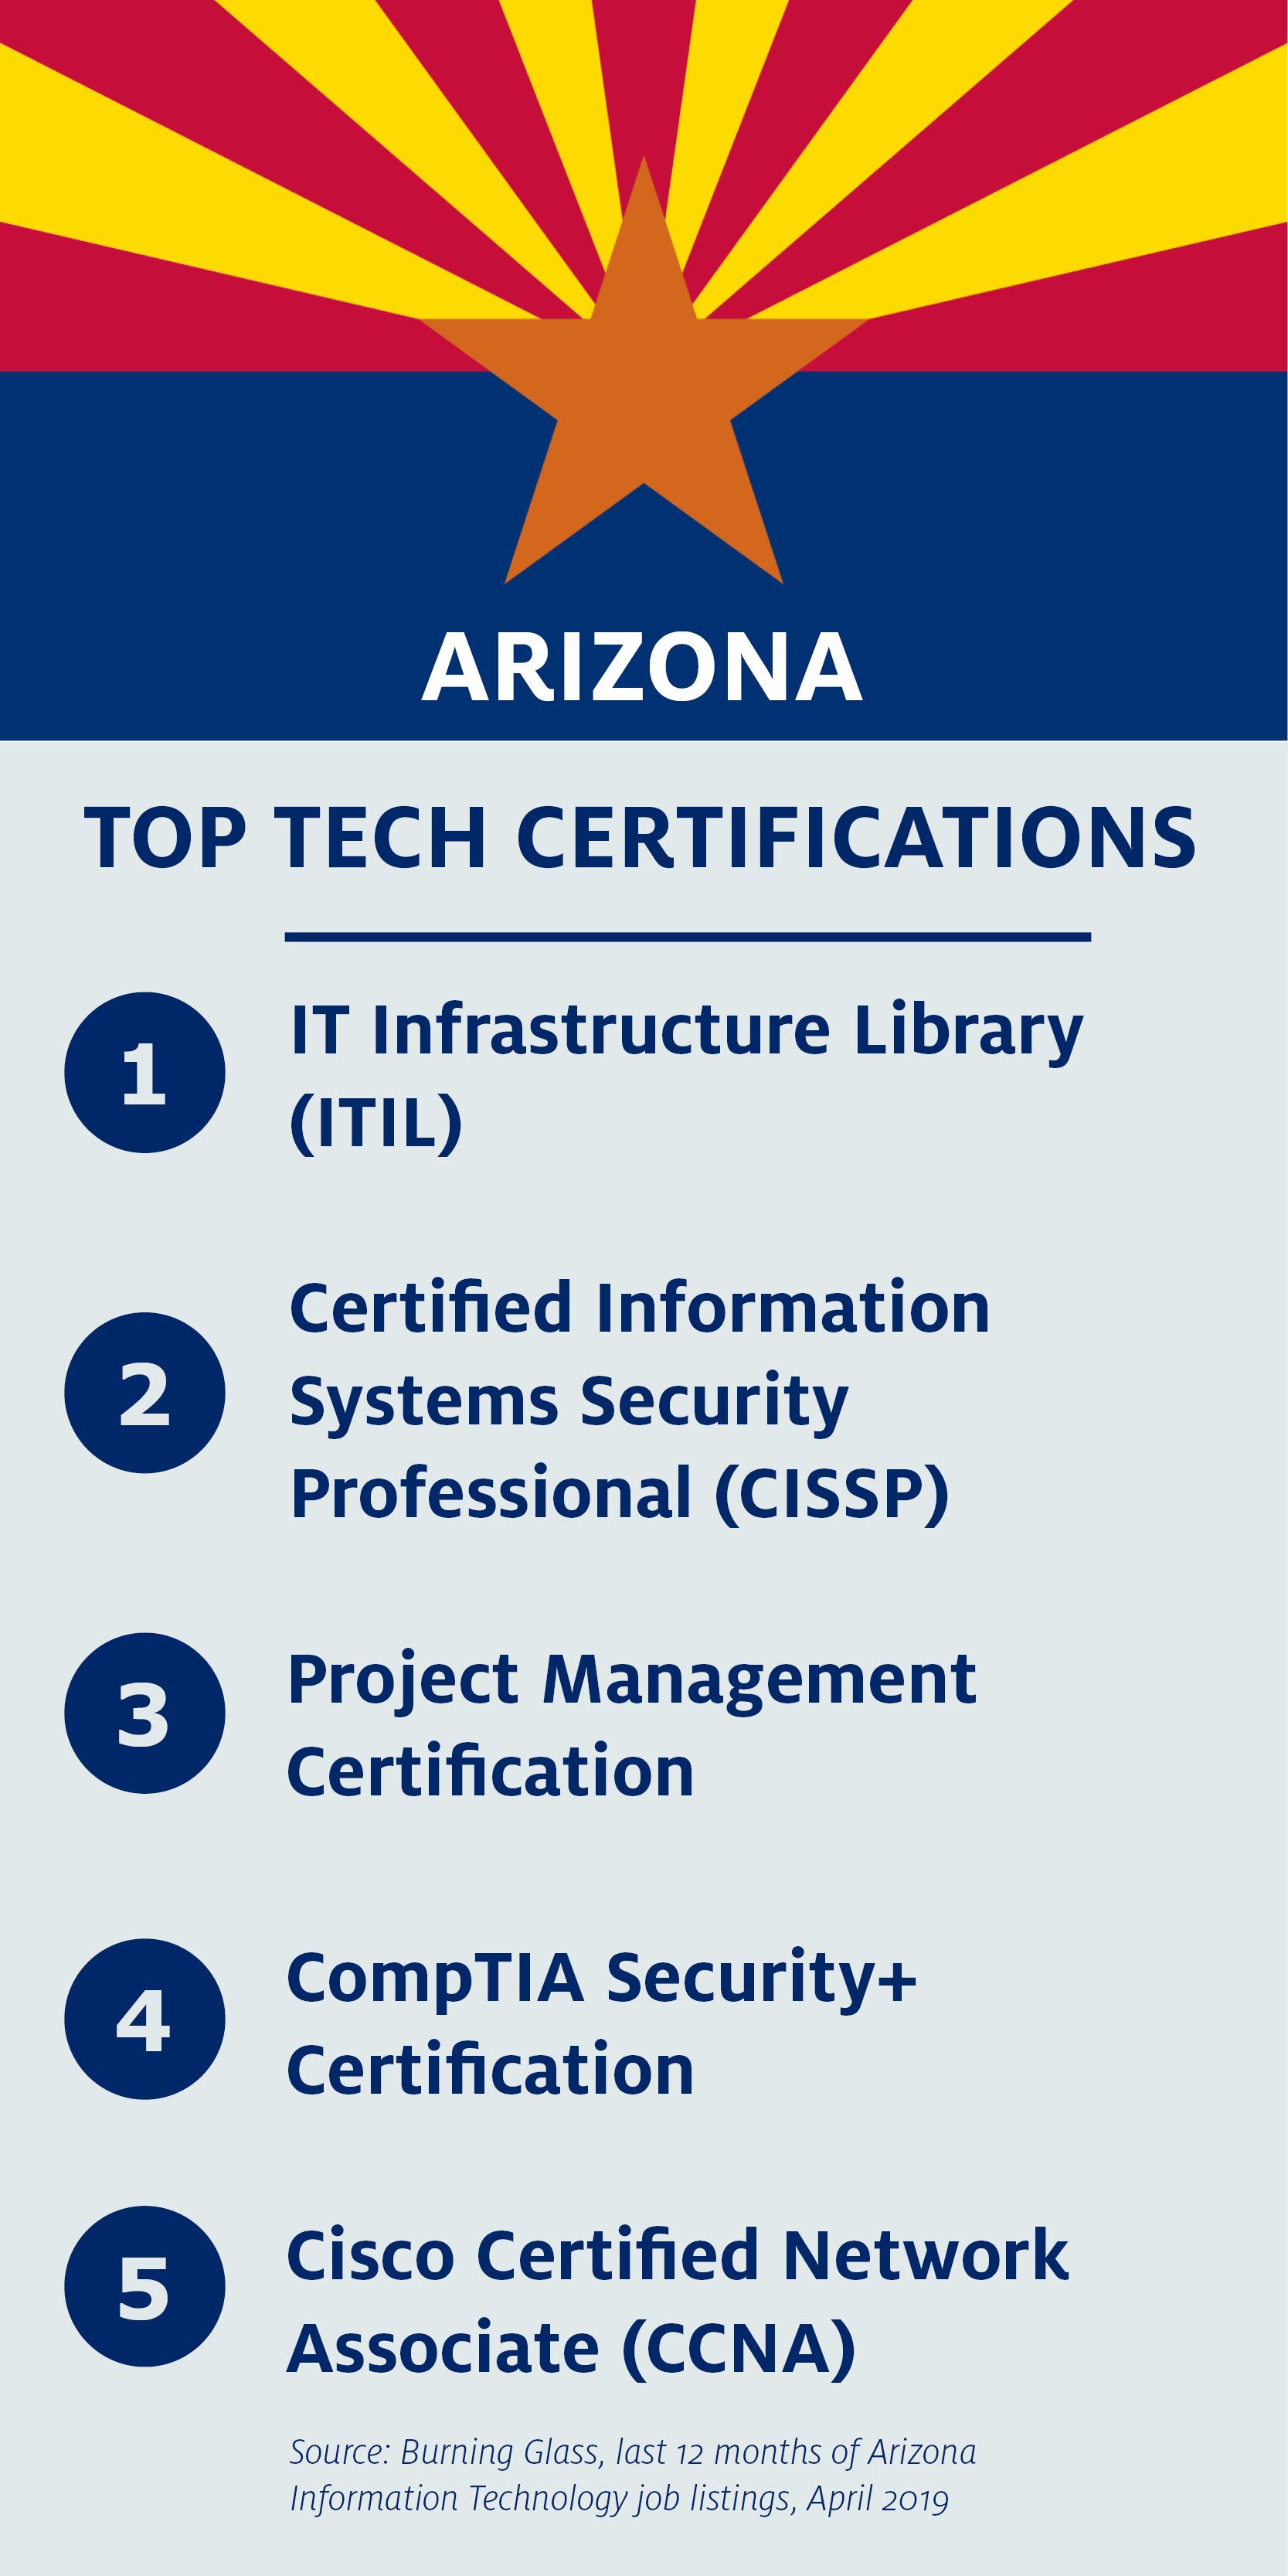 Top Arizona IT certifications: ITIL, CISSP, Project Management, CompTIA Network+, CCNA